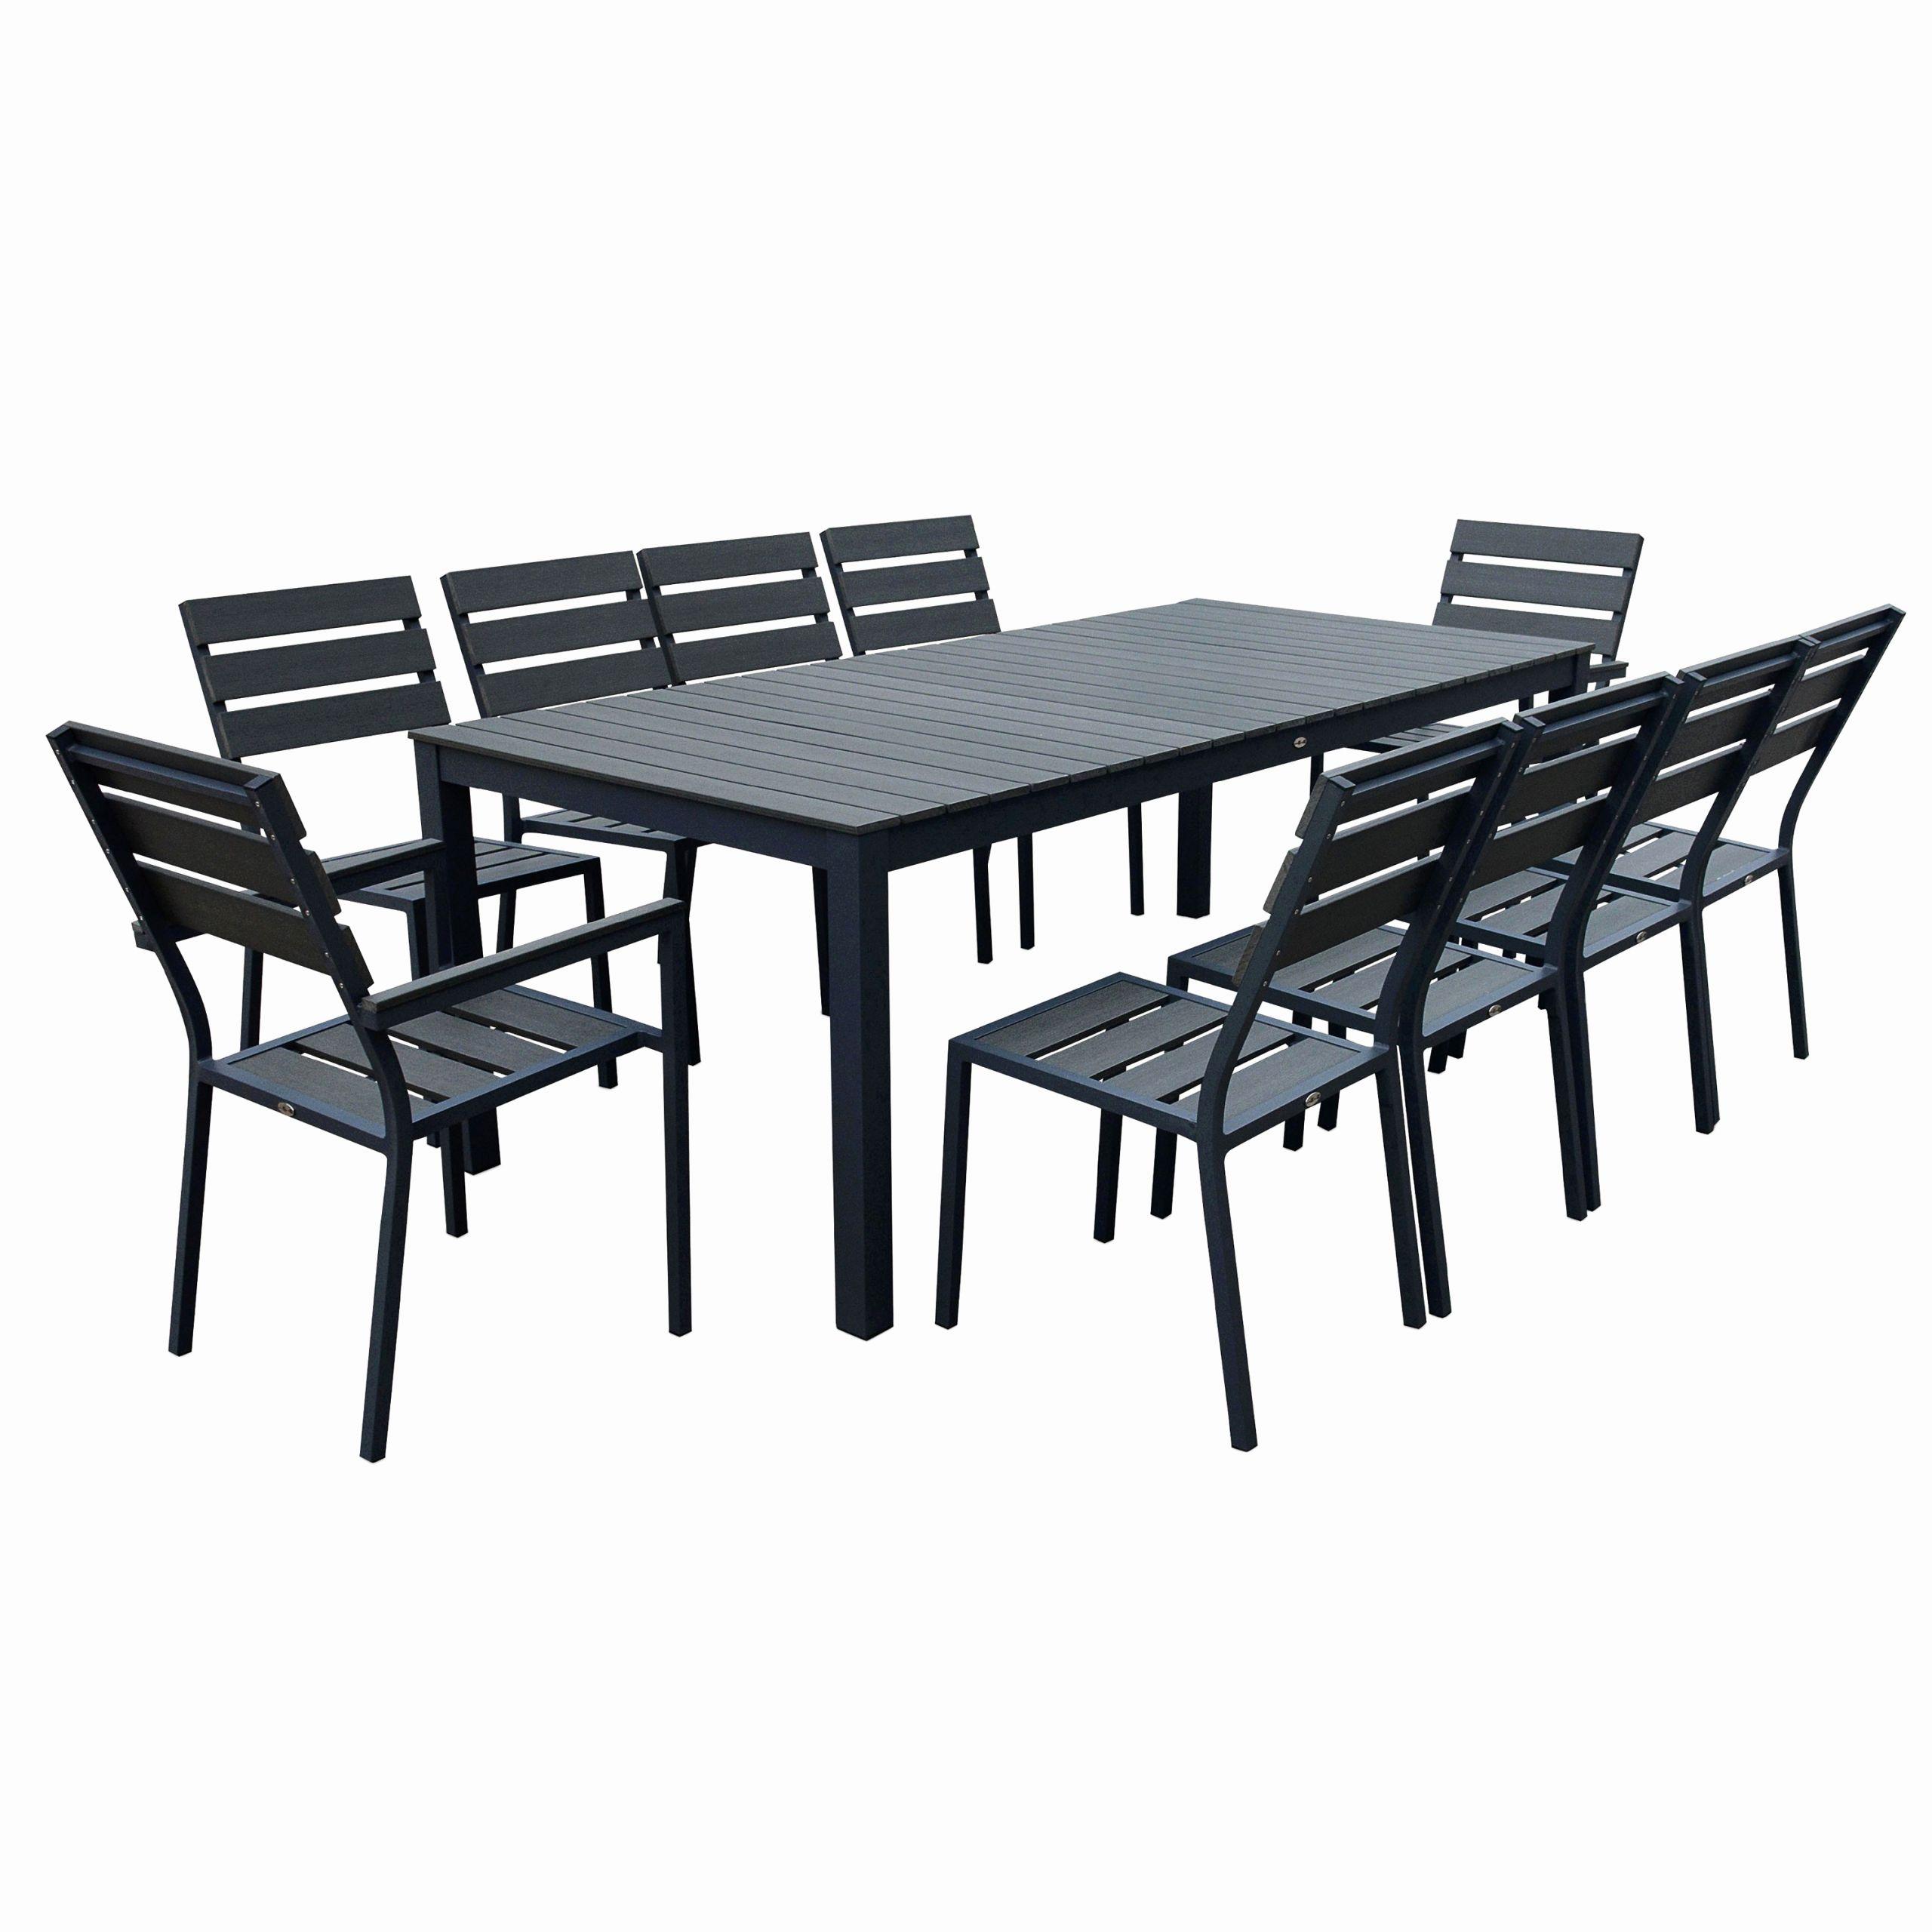 table de jardin alinea inspire table teck alinea beau table a manger chaises lovely table haute but of table de jardin alinea